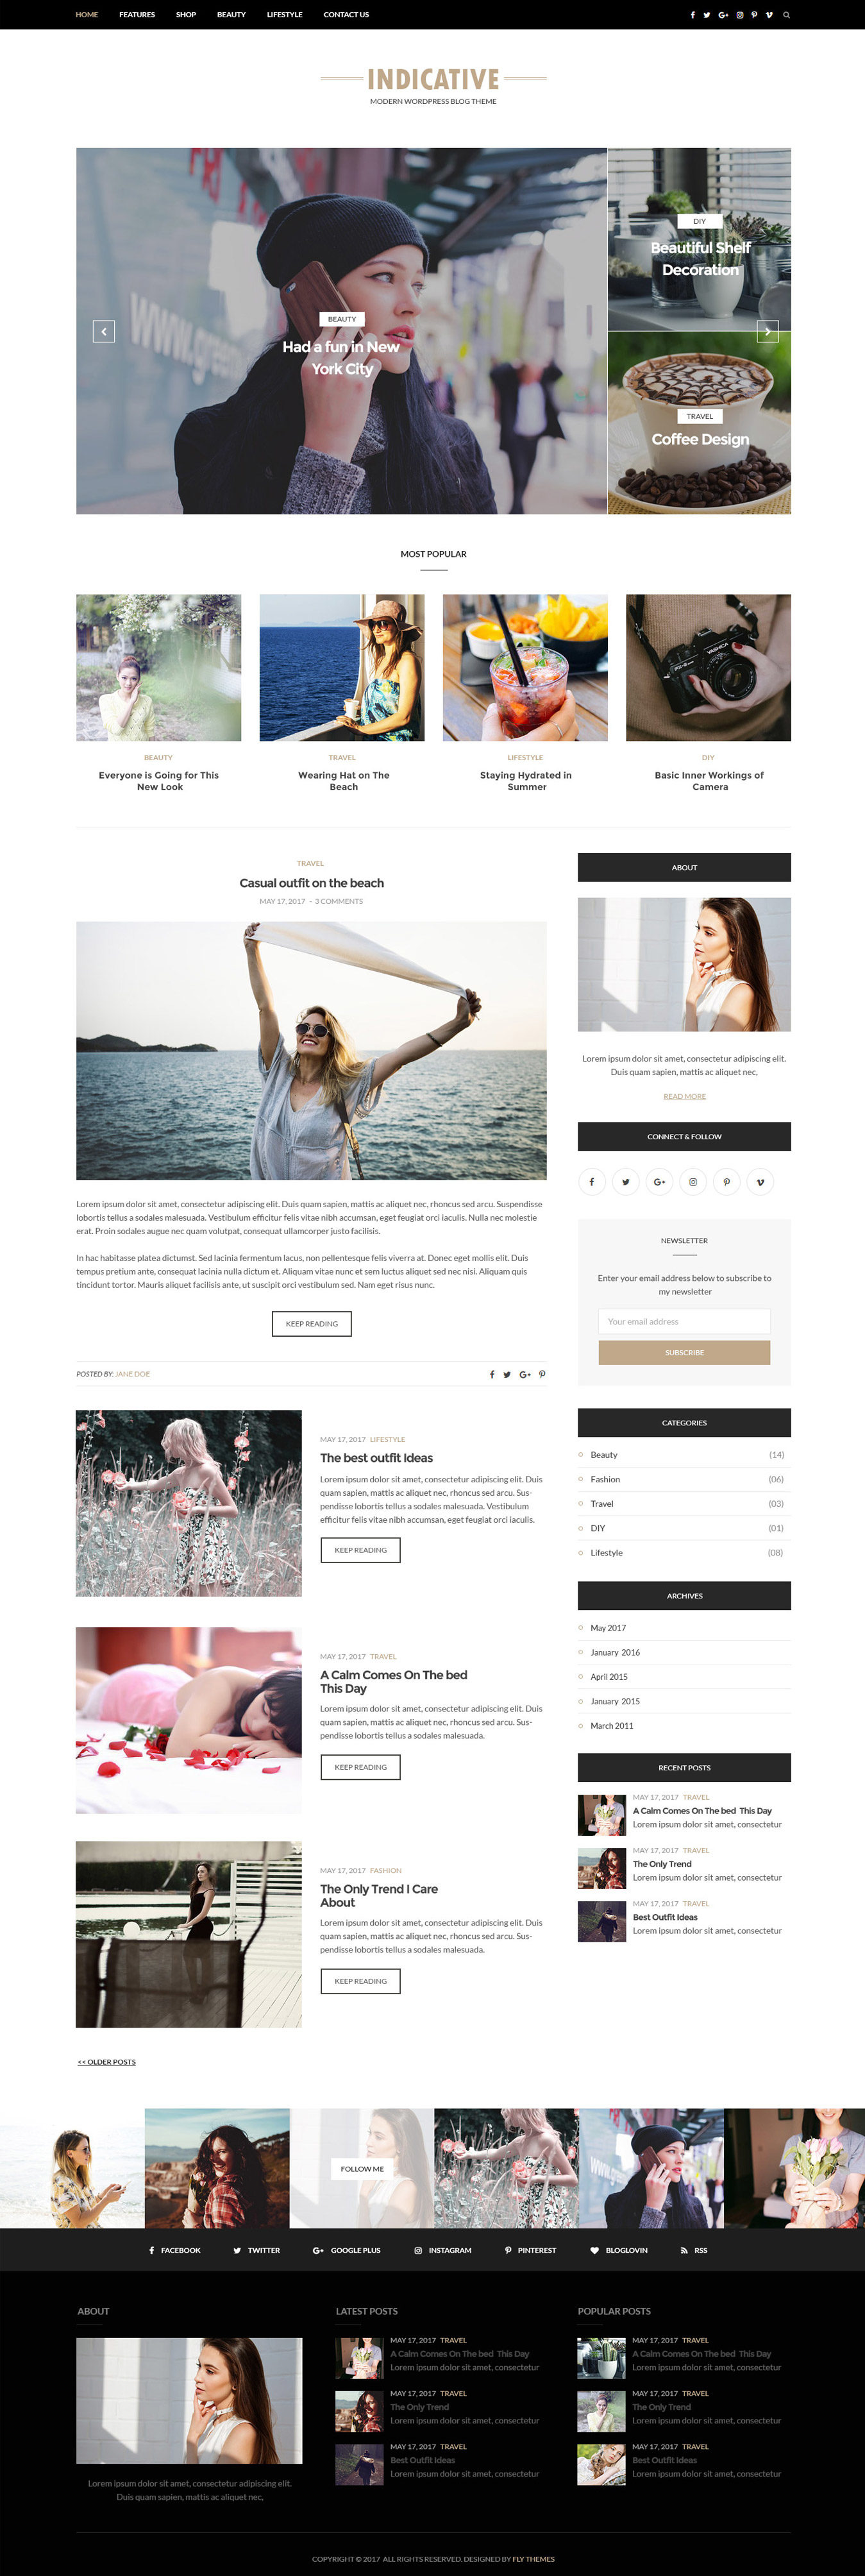 indicative-blog-wordpress-theme